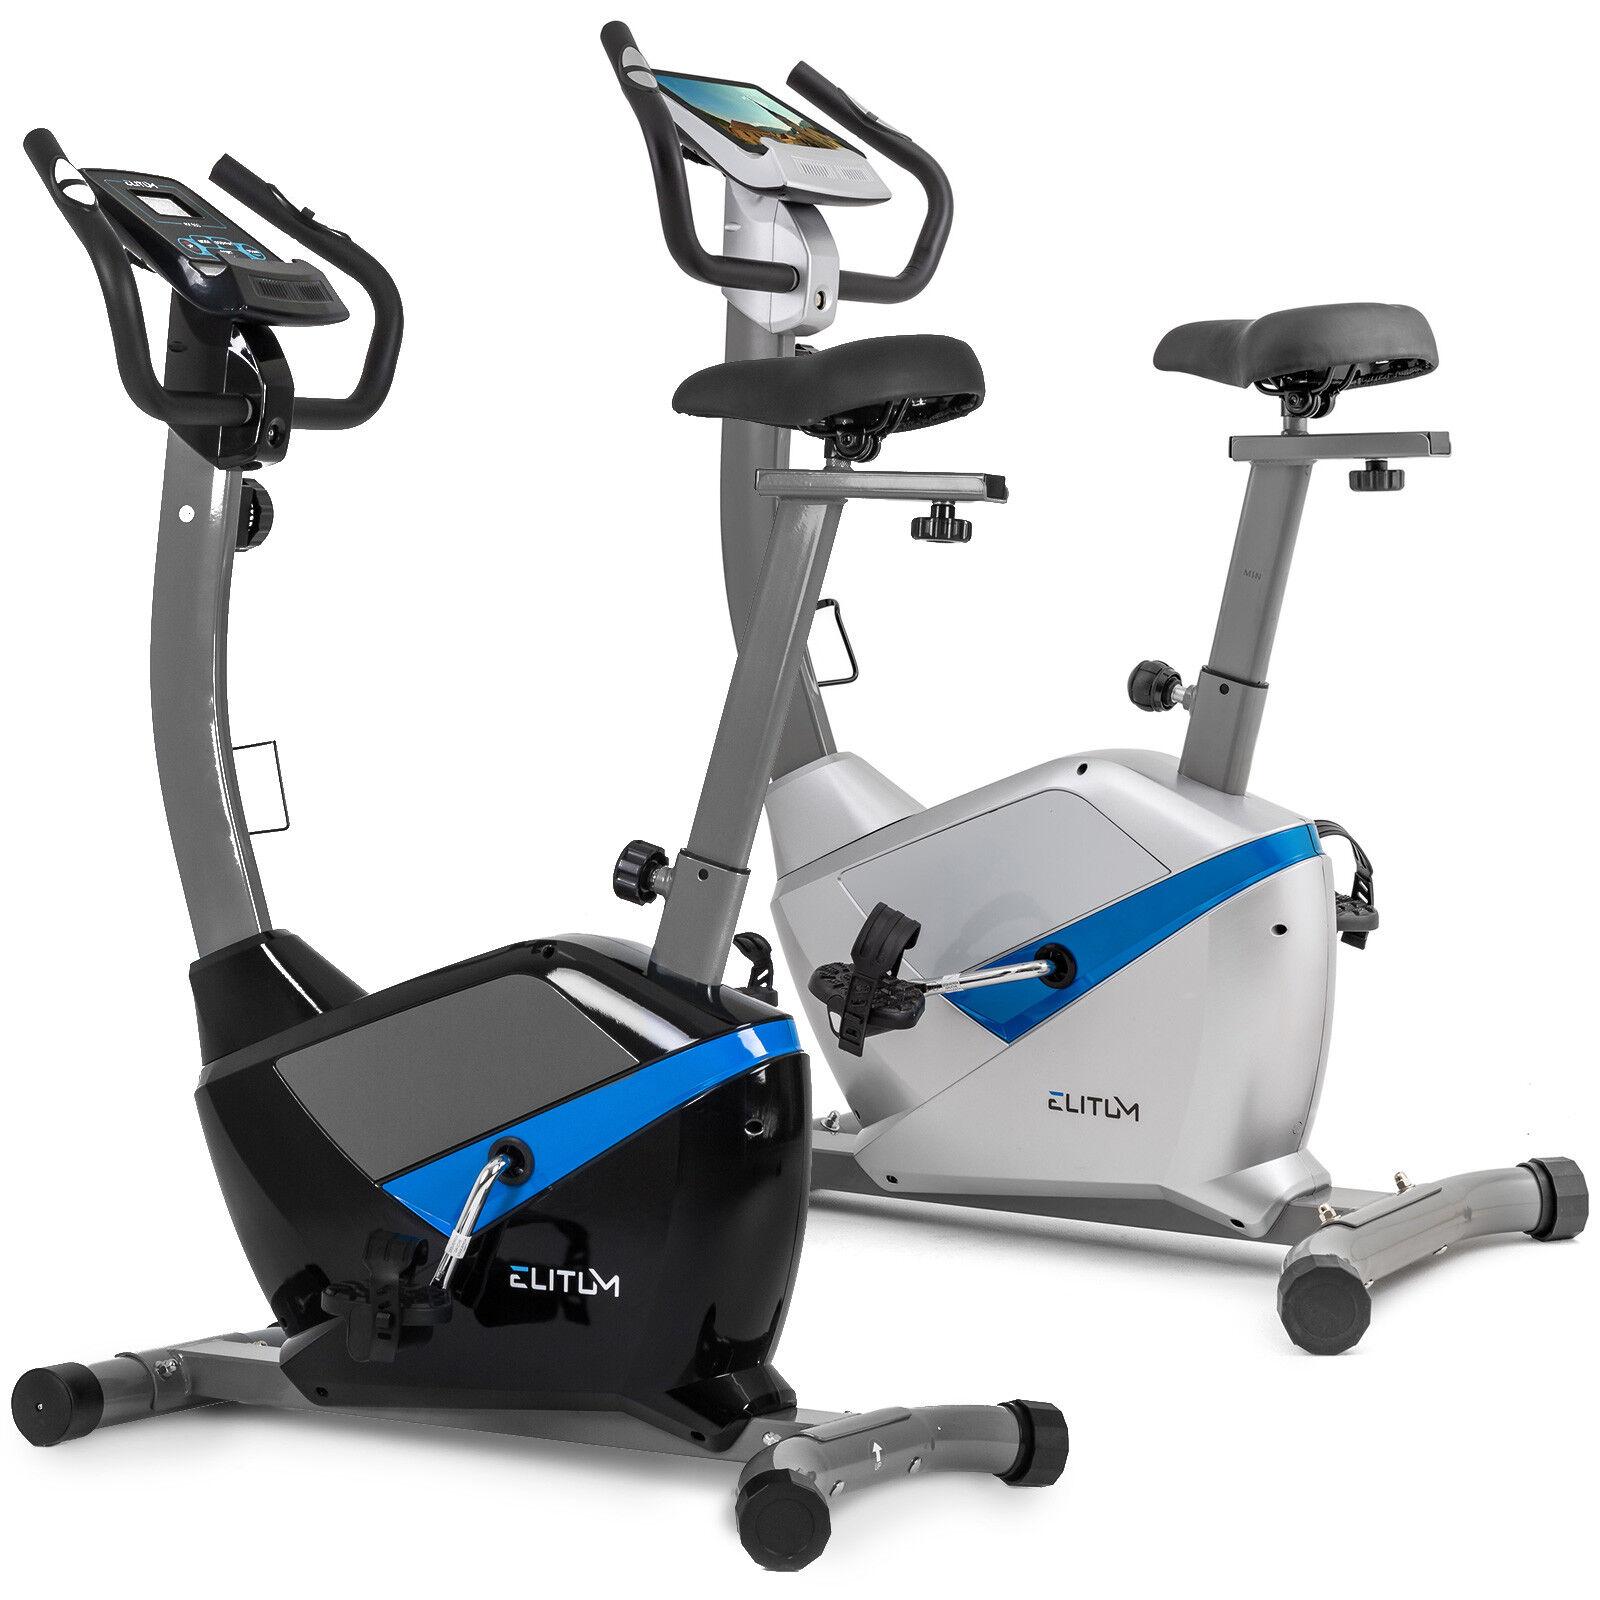 Fitnessgerät X Form klappbar Ergometer Trimmrad Fahrrad Cardio Bike Heimtrainer